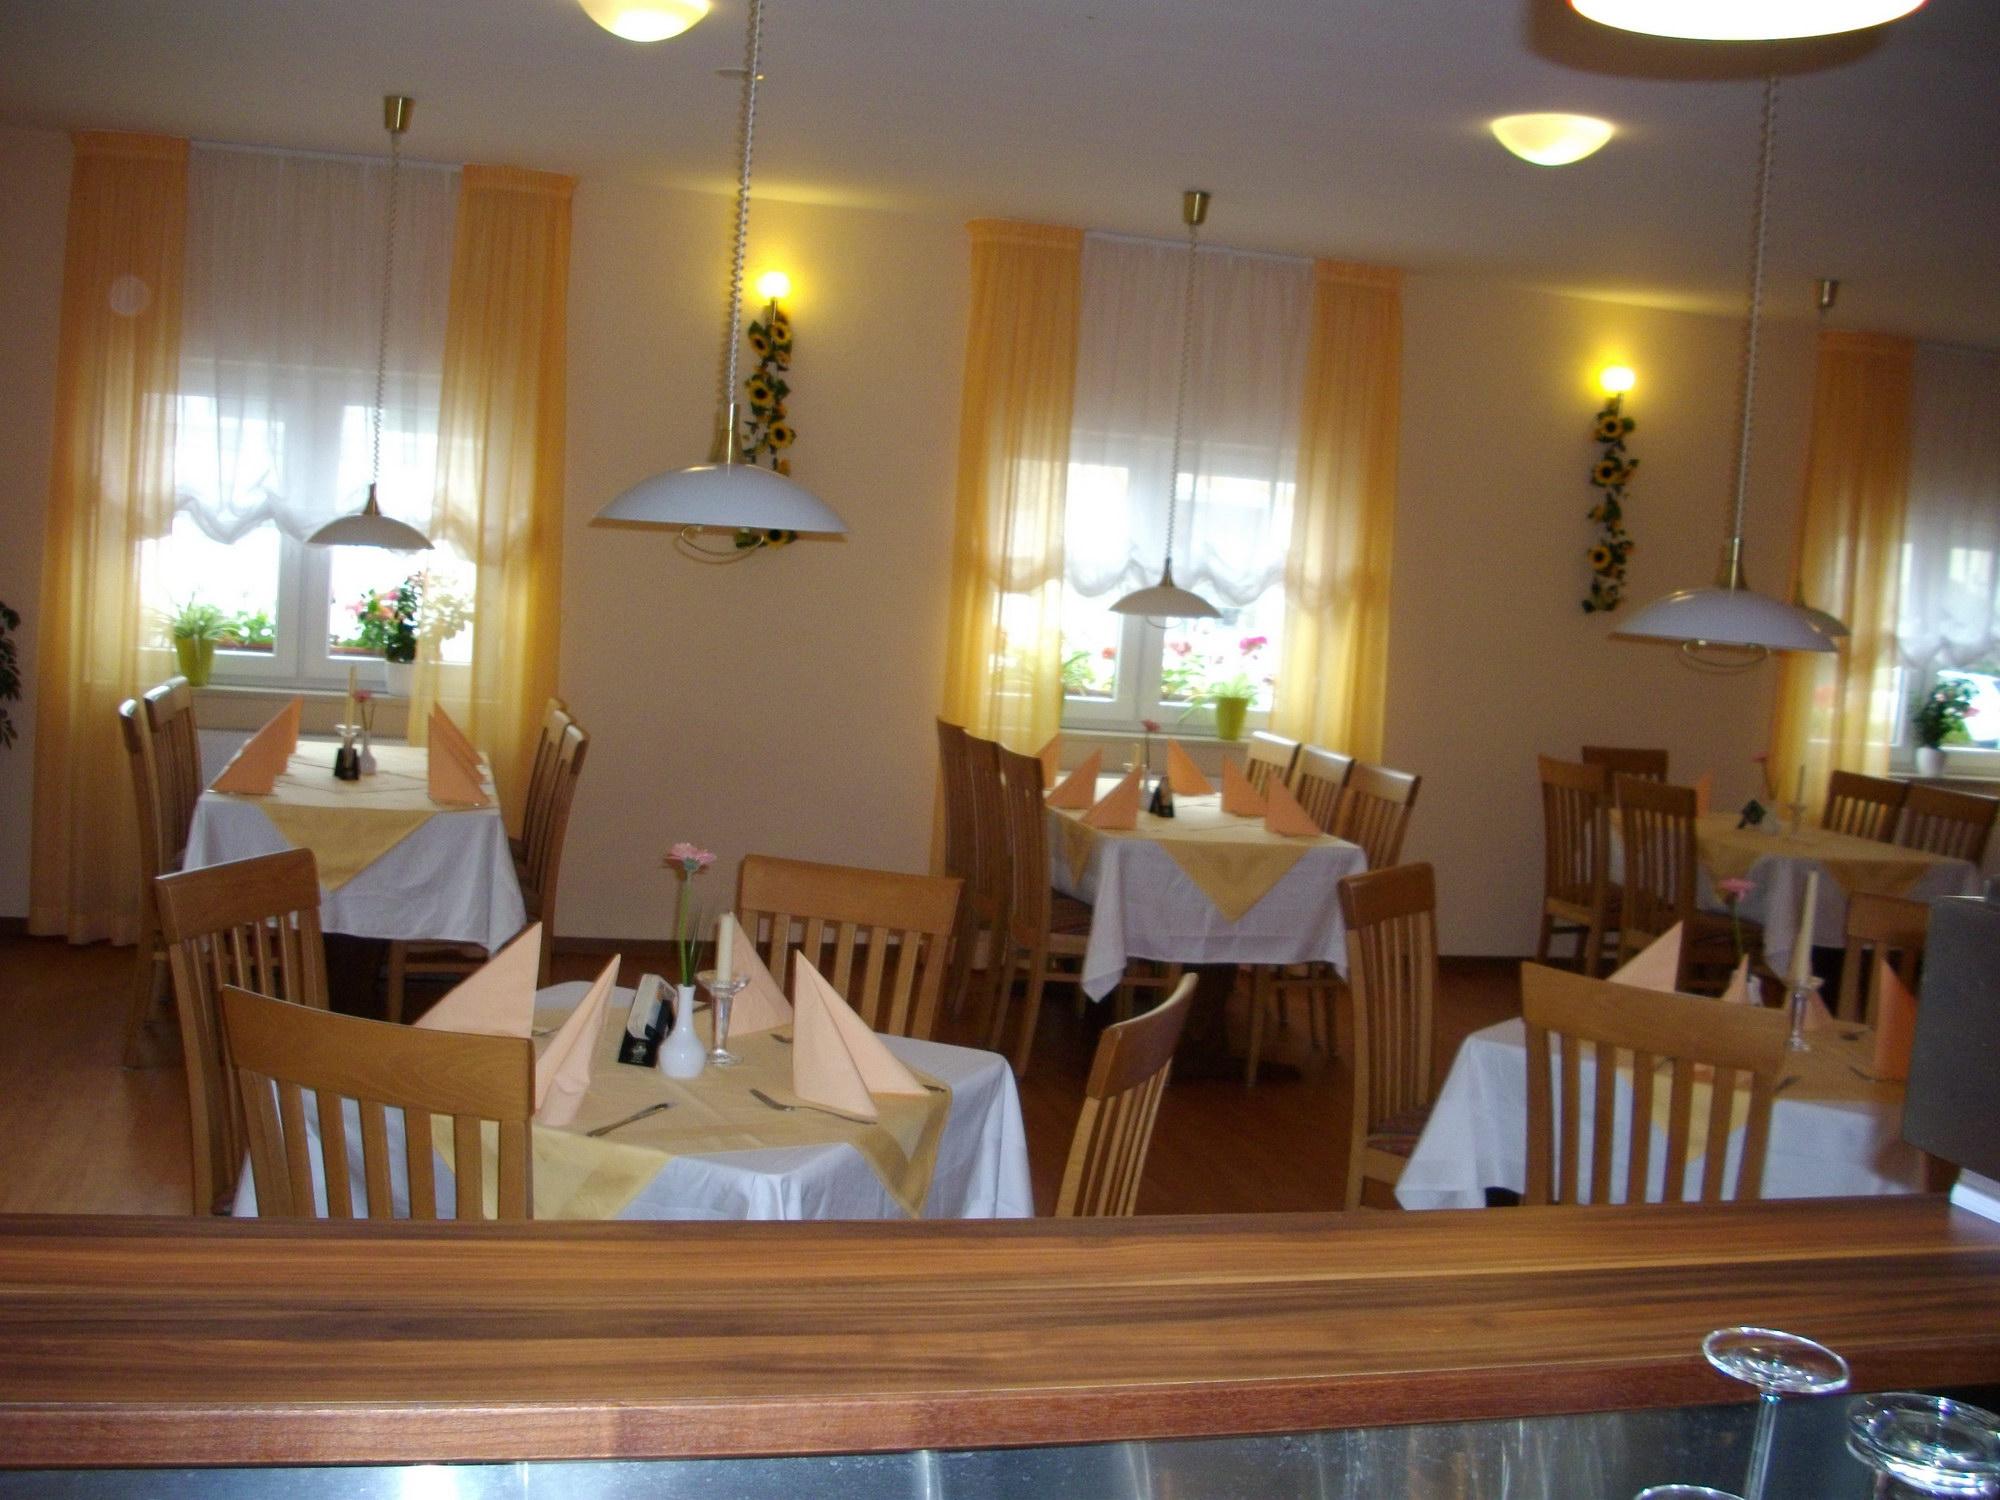 Ristorante - Pizzeria La Fontana - Unsere Fotos im Restaurant ...